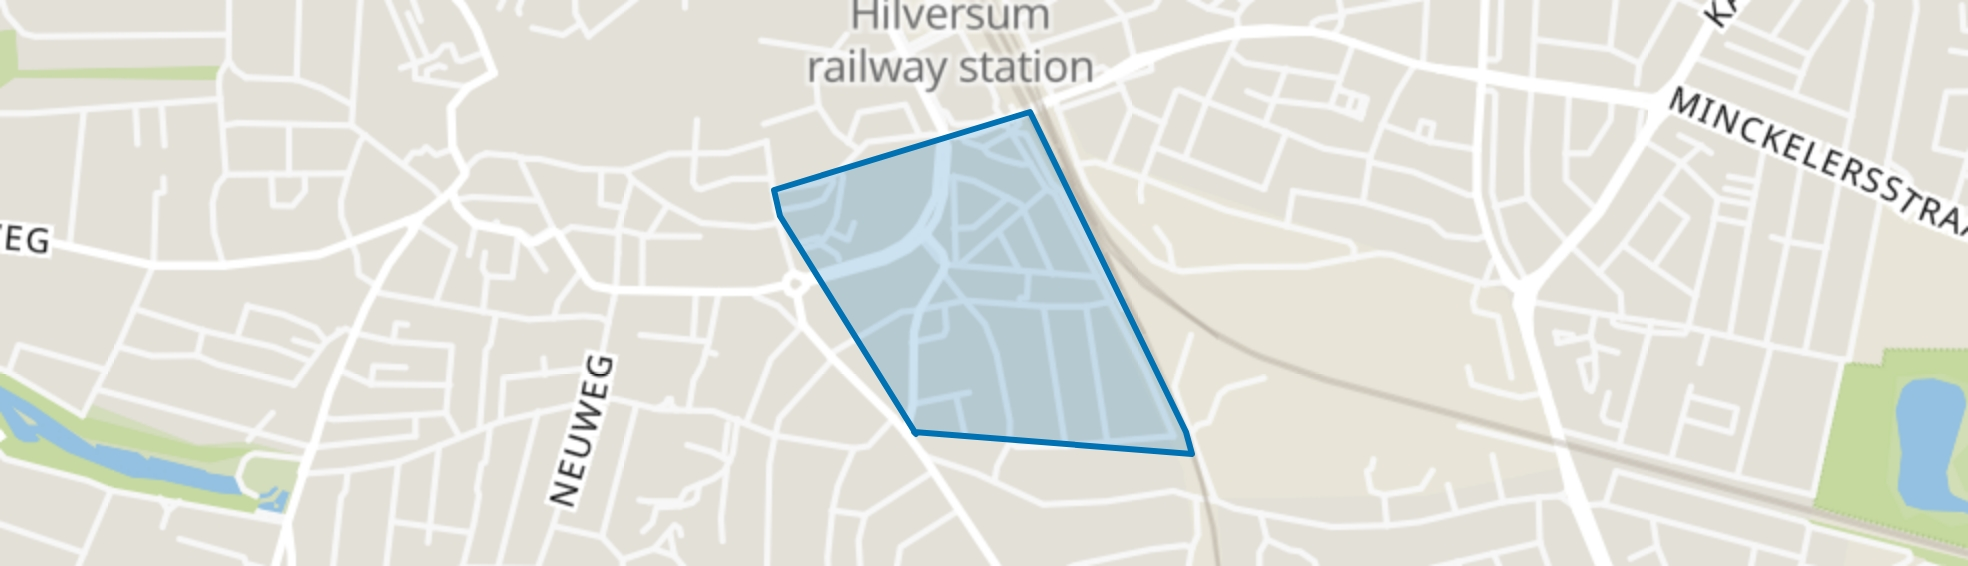 Sint Vitusbuurt, Hilversum map